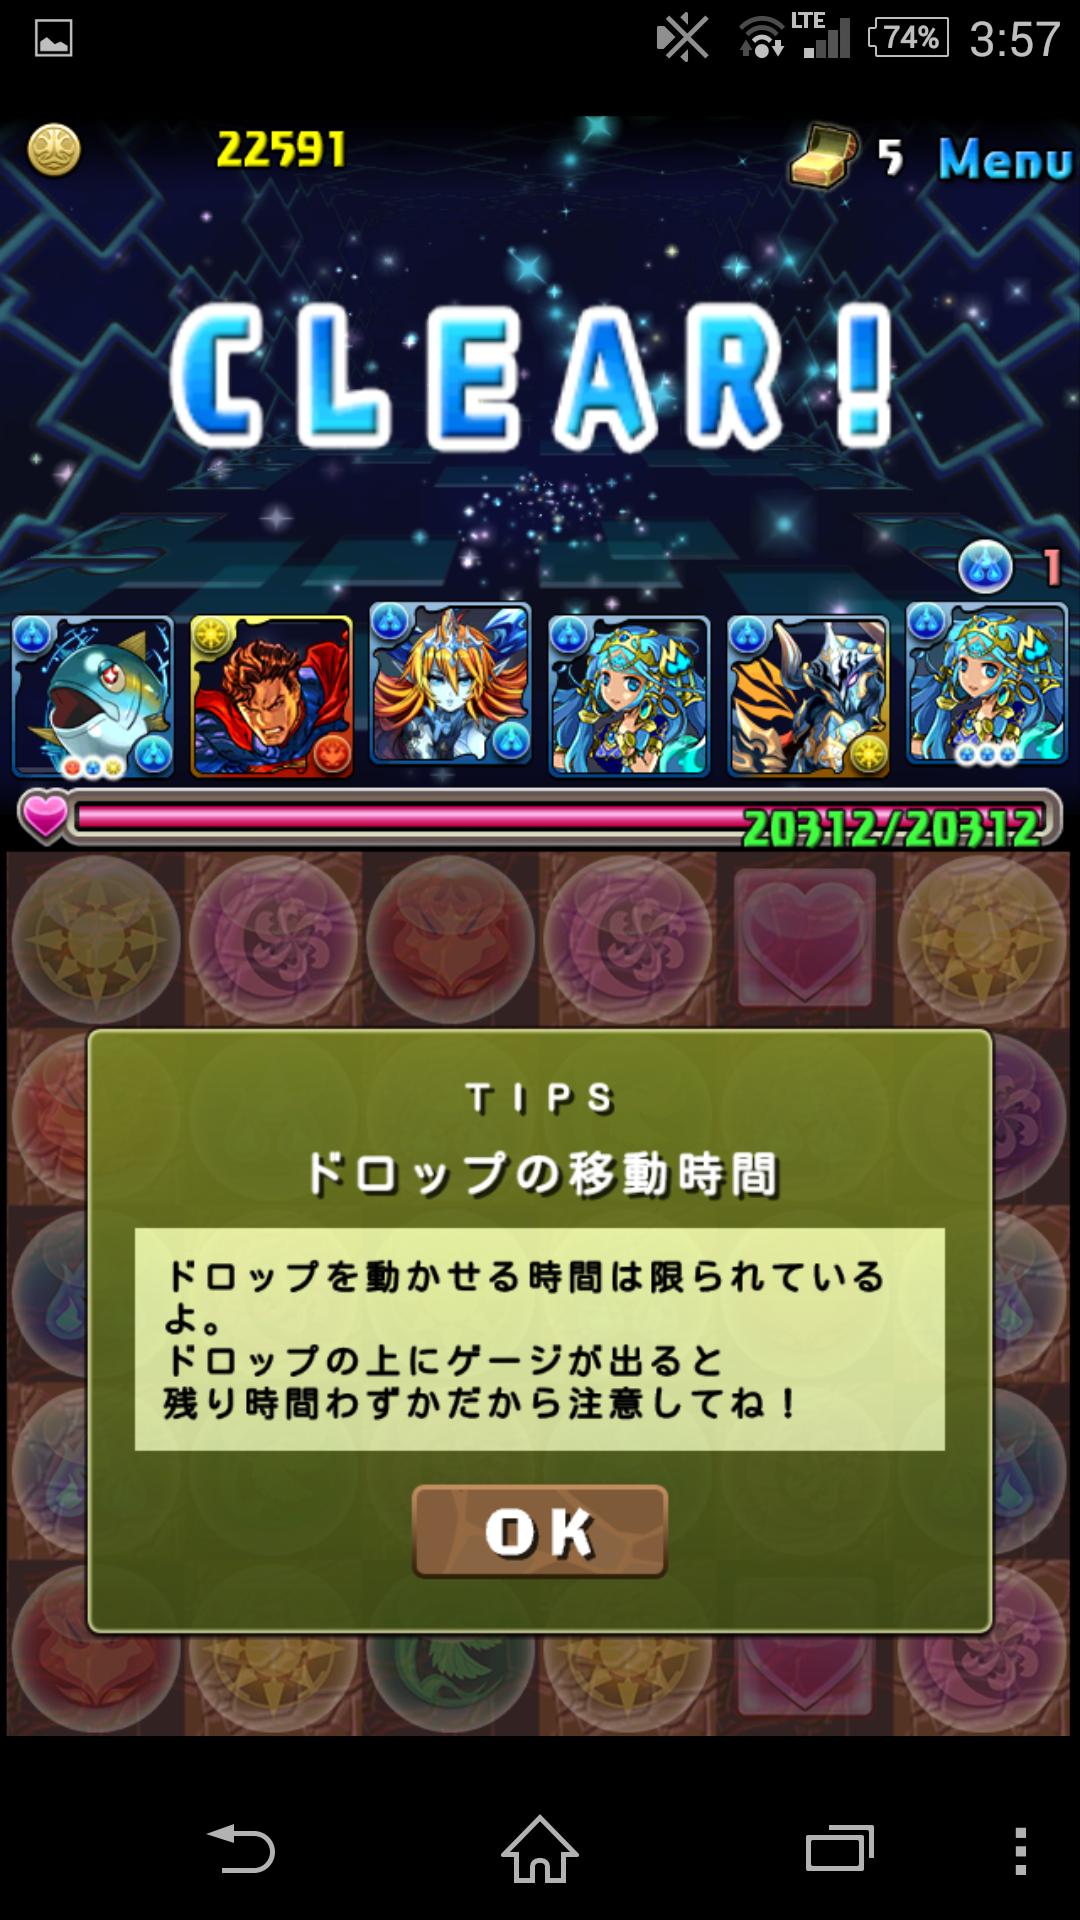 Screenshot_2014-12-16-03-58-00.png